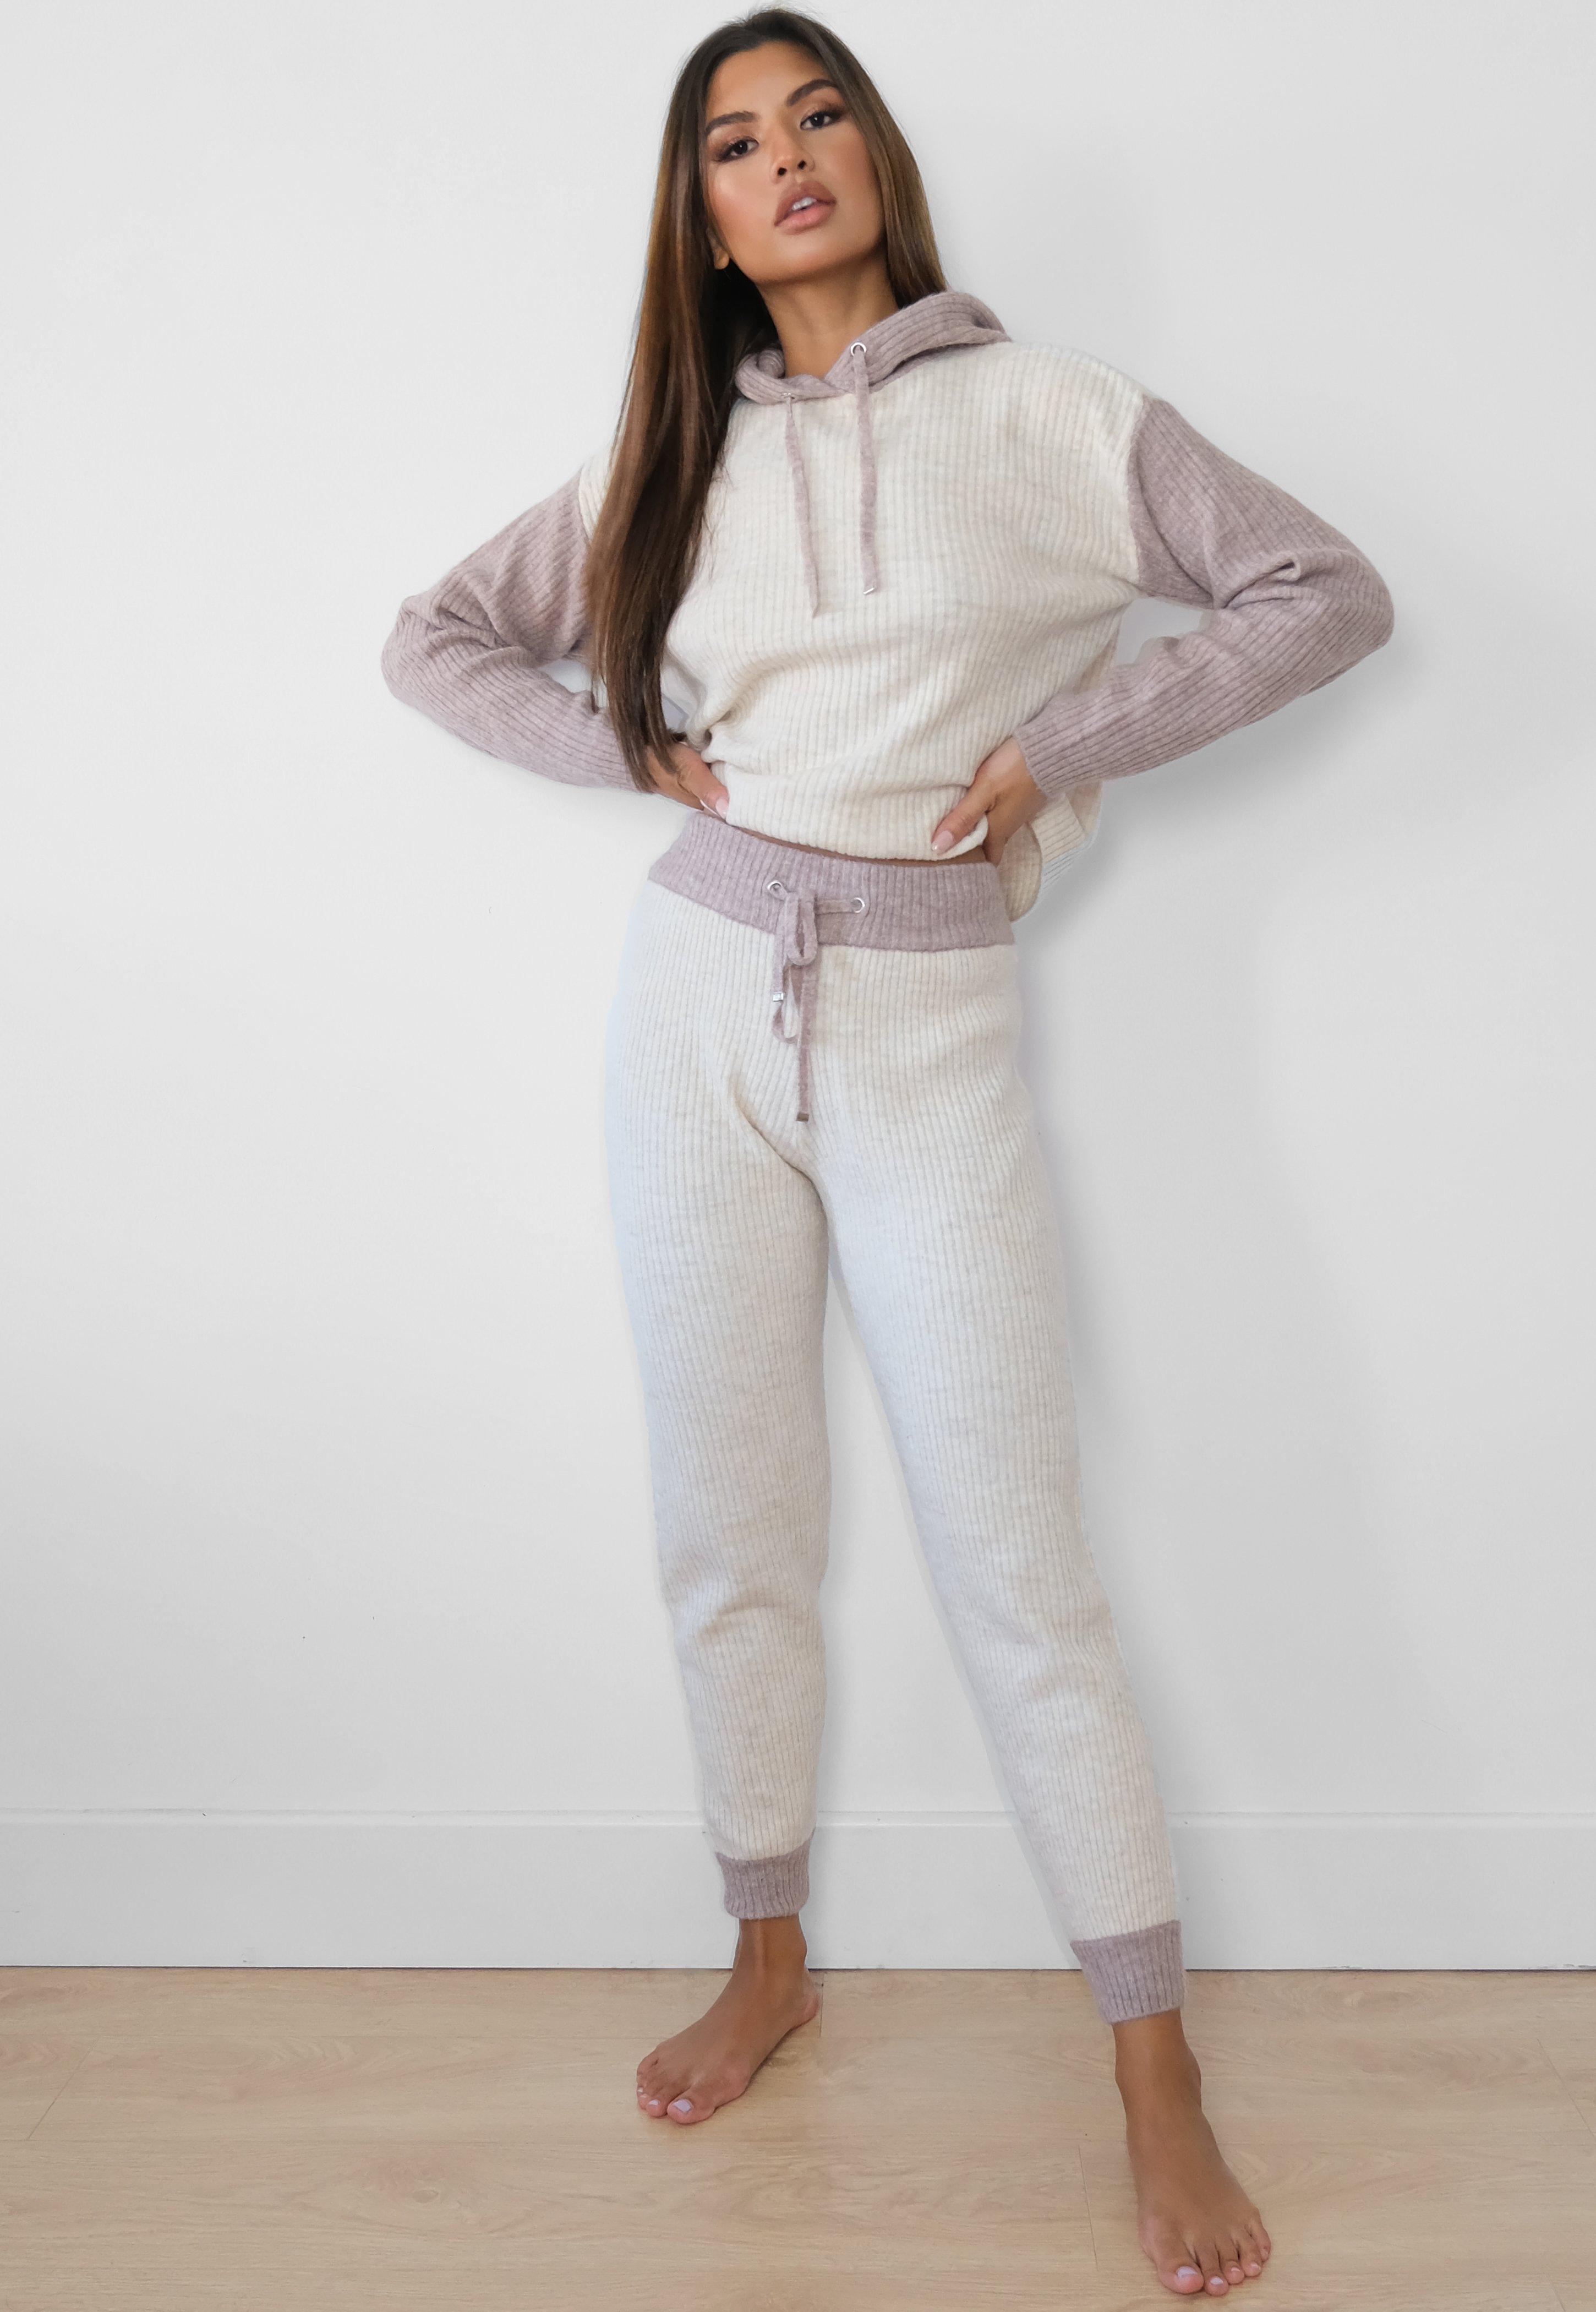 Pantalon Jogger En Dos Tonos Para Combinar Para Mujeres Altas En Color Piedra Missguided